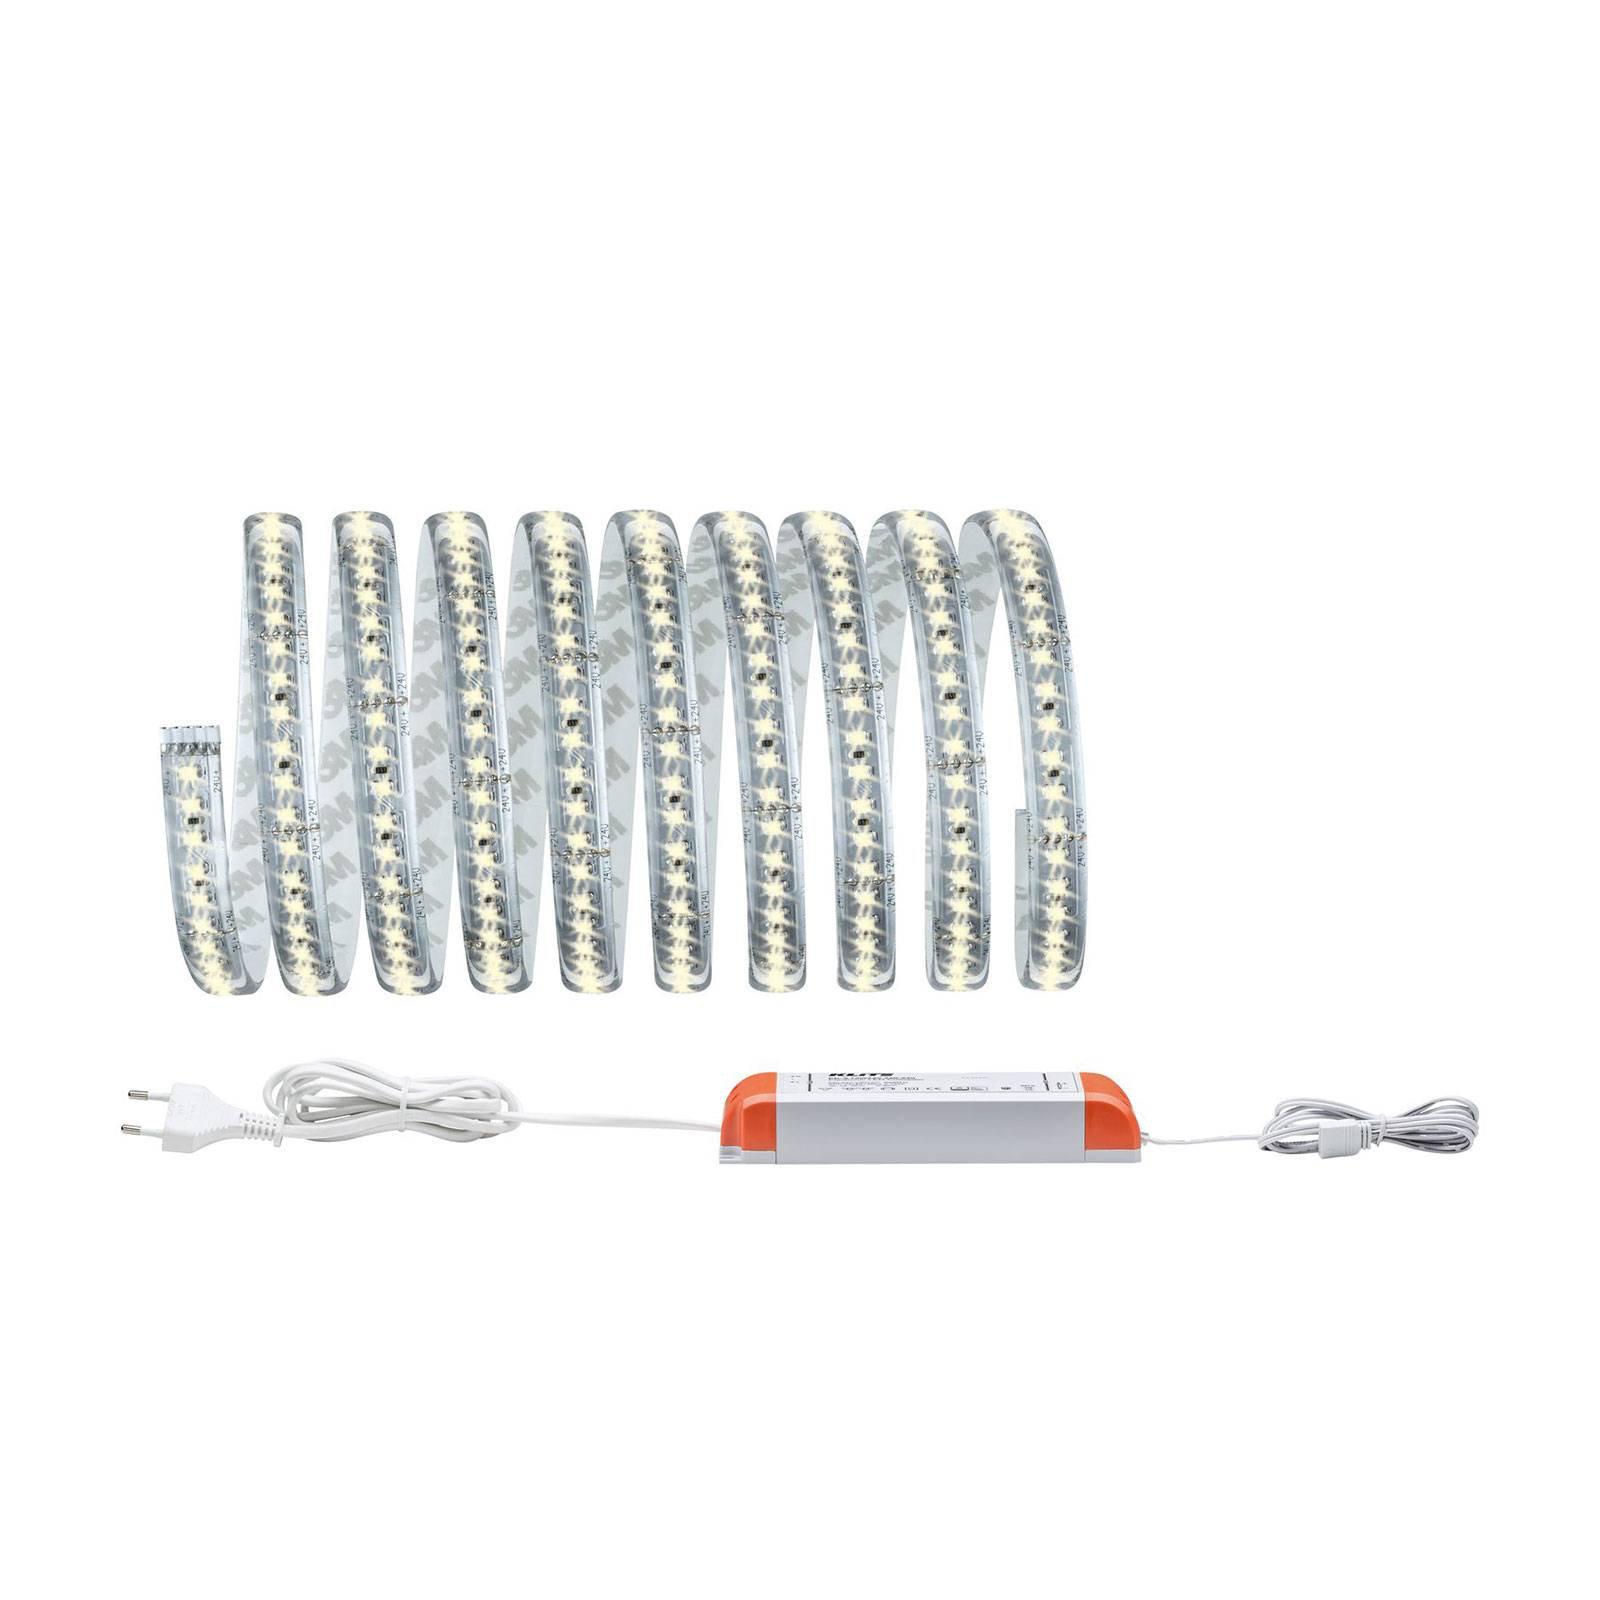 Paulmann MaxLED 1000 pakke LED-stripe, 3 m, 2700K